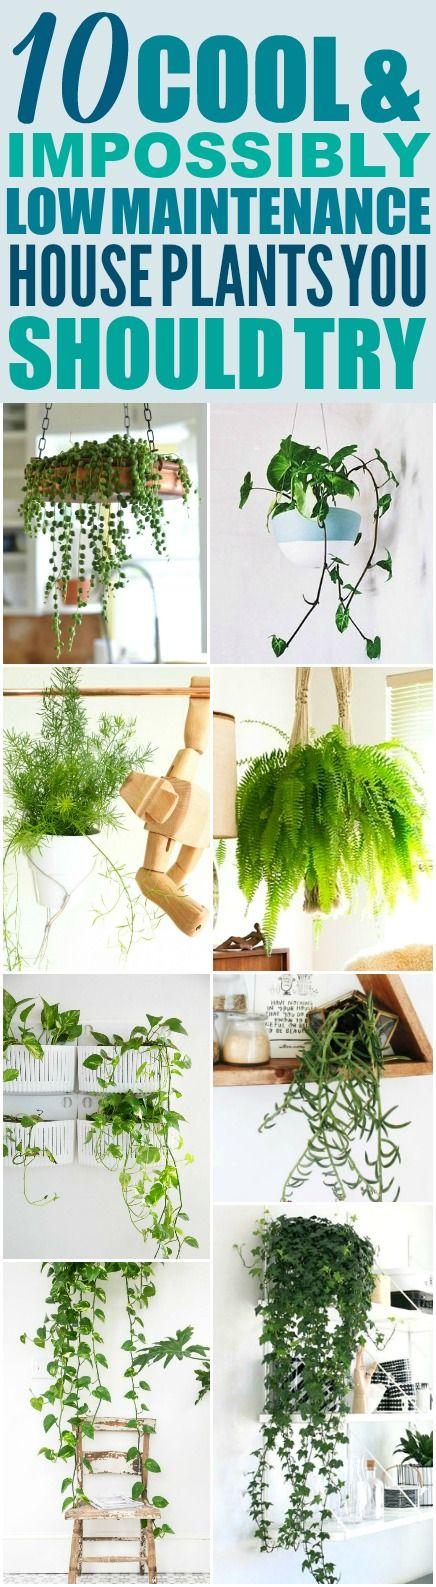 25 best ideas about low maintenance plants on pinterest easy plants to grow house plants and - Easy maintenance house plants ...